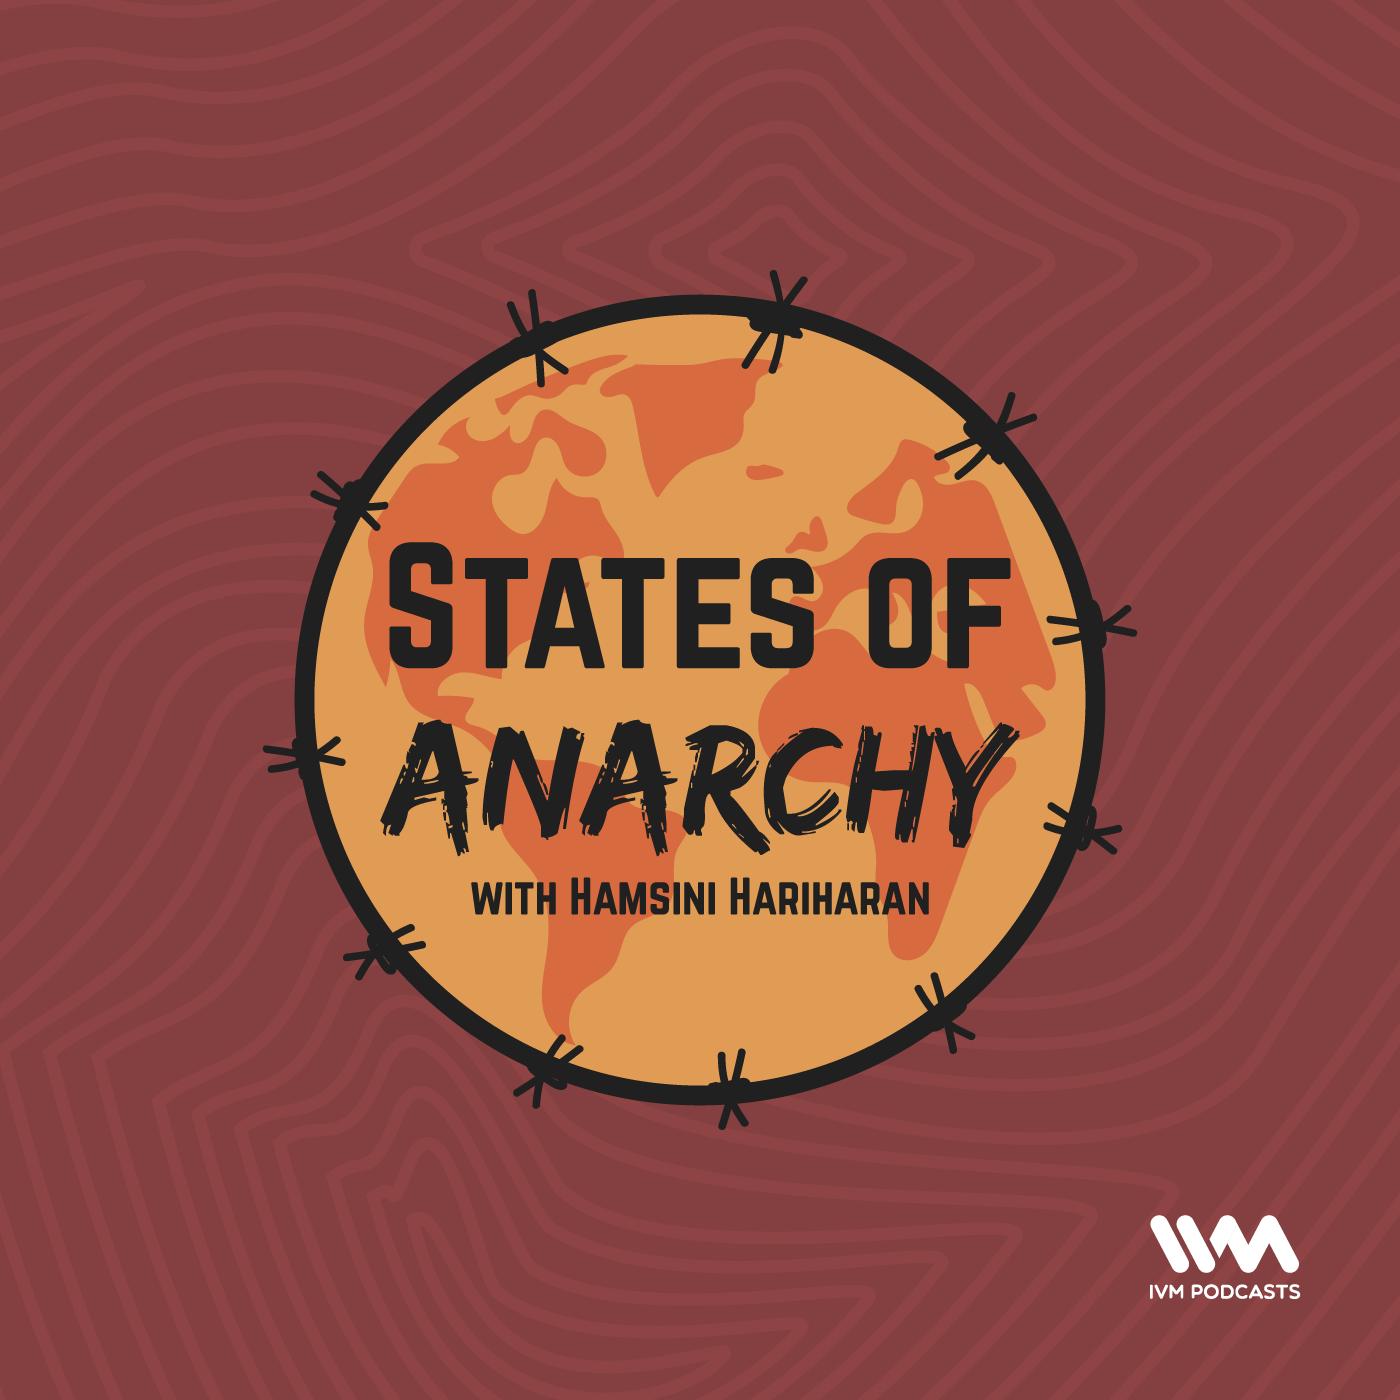 Ep. 00: Introducing States of Anarchy with Hamsini Hariharan